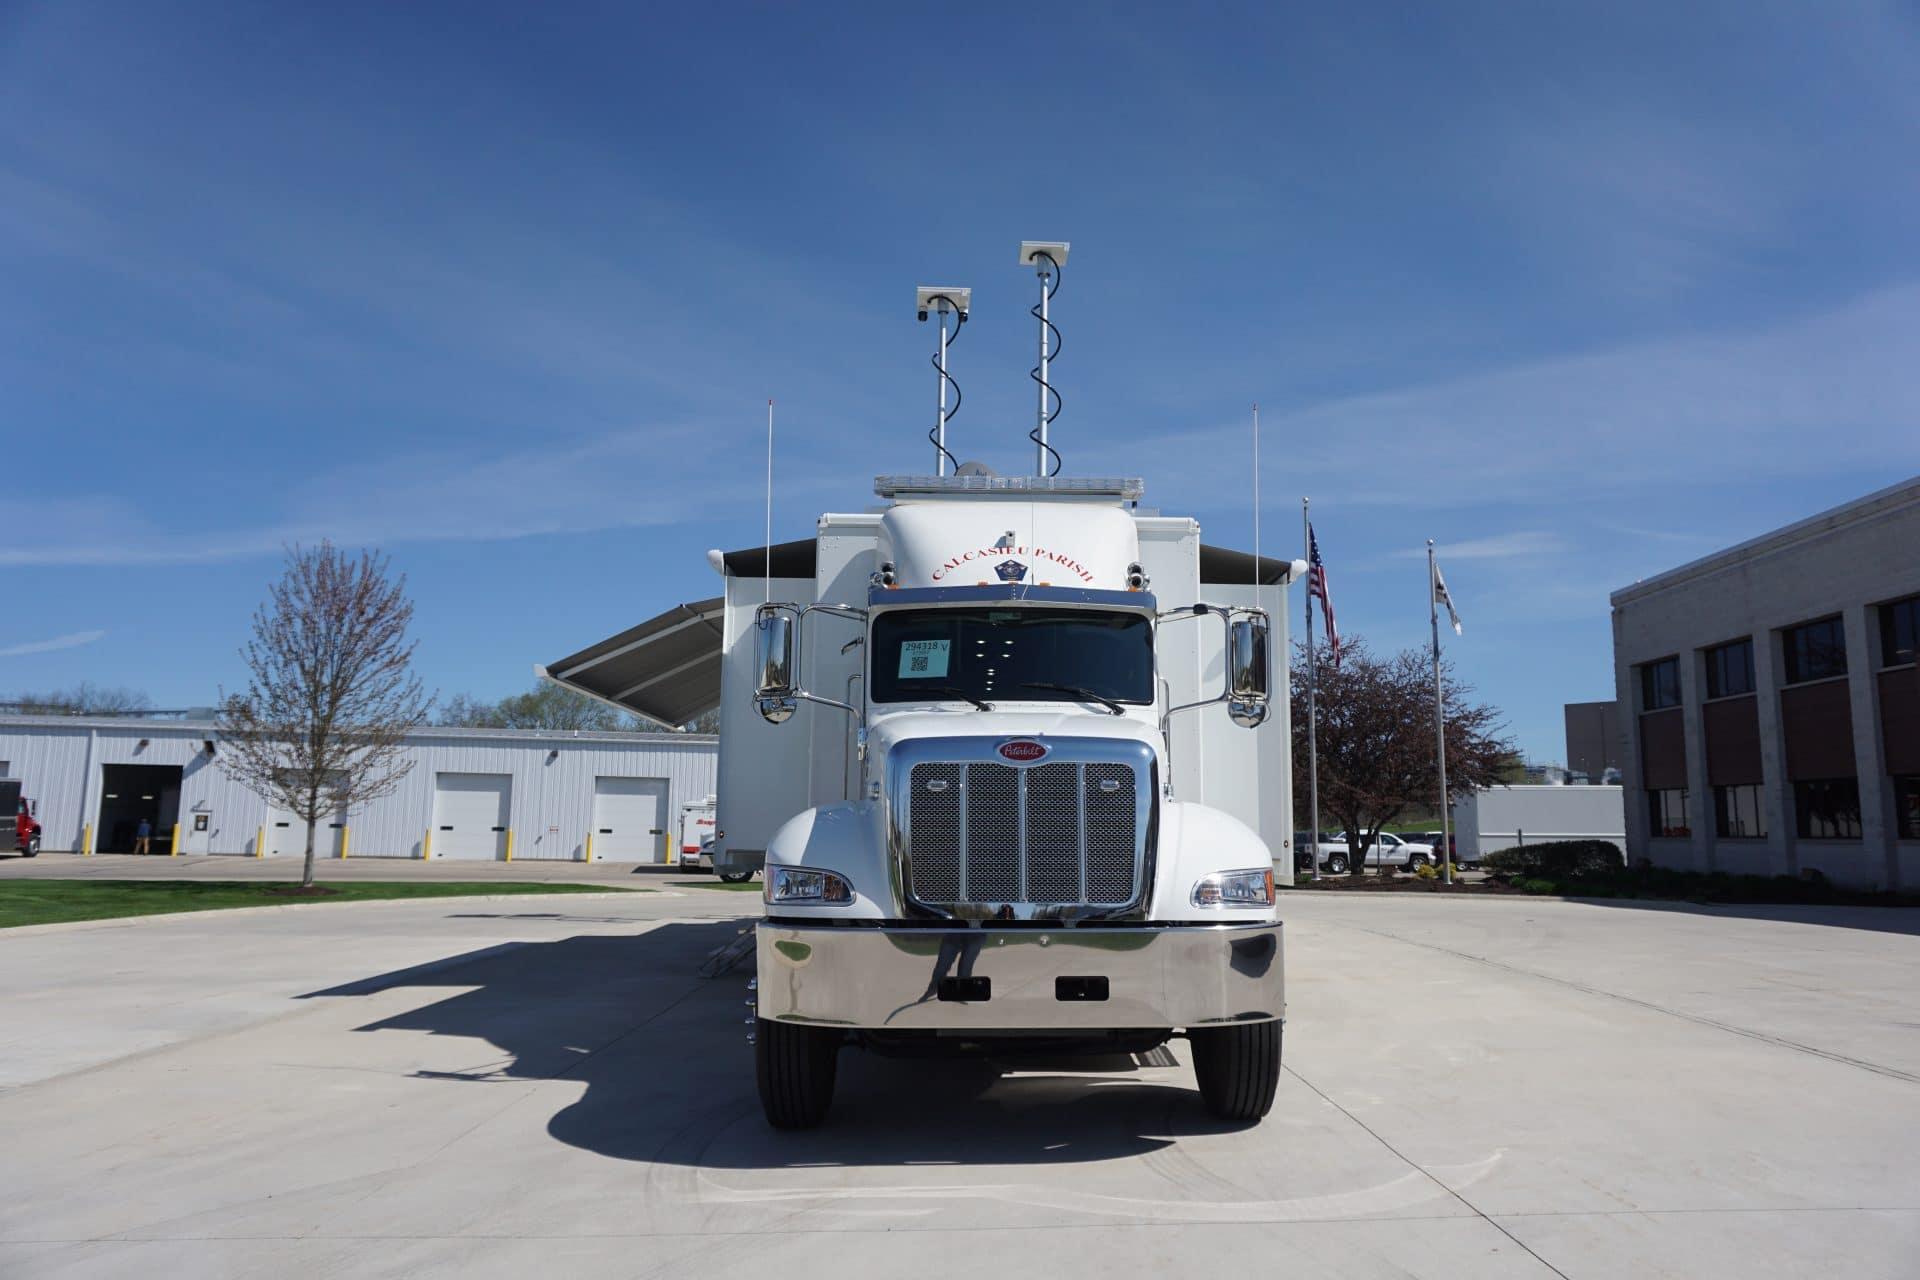 Calcasieu Parish OHSEP LDV Mobile Command Vehicle